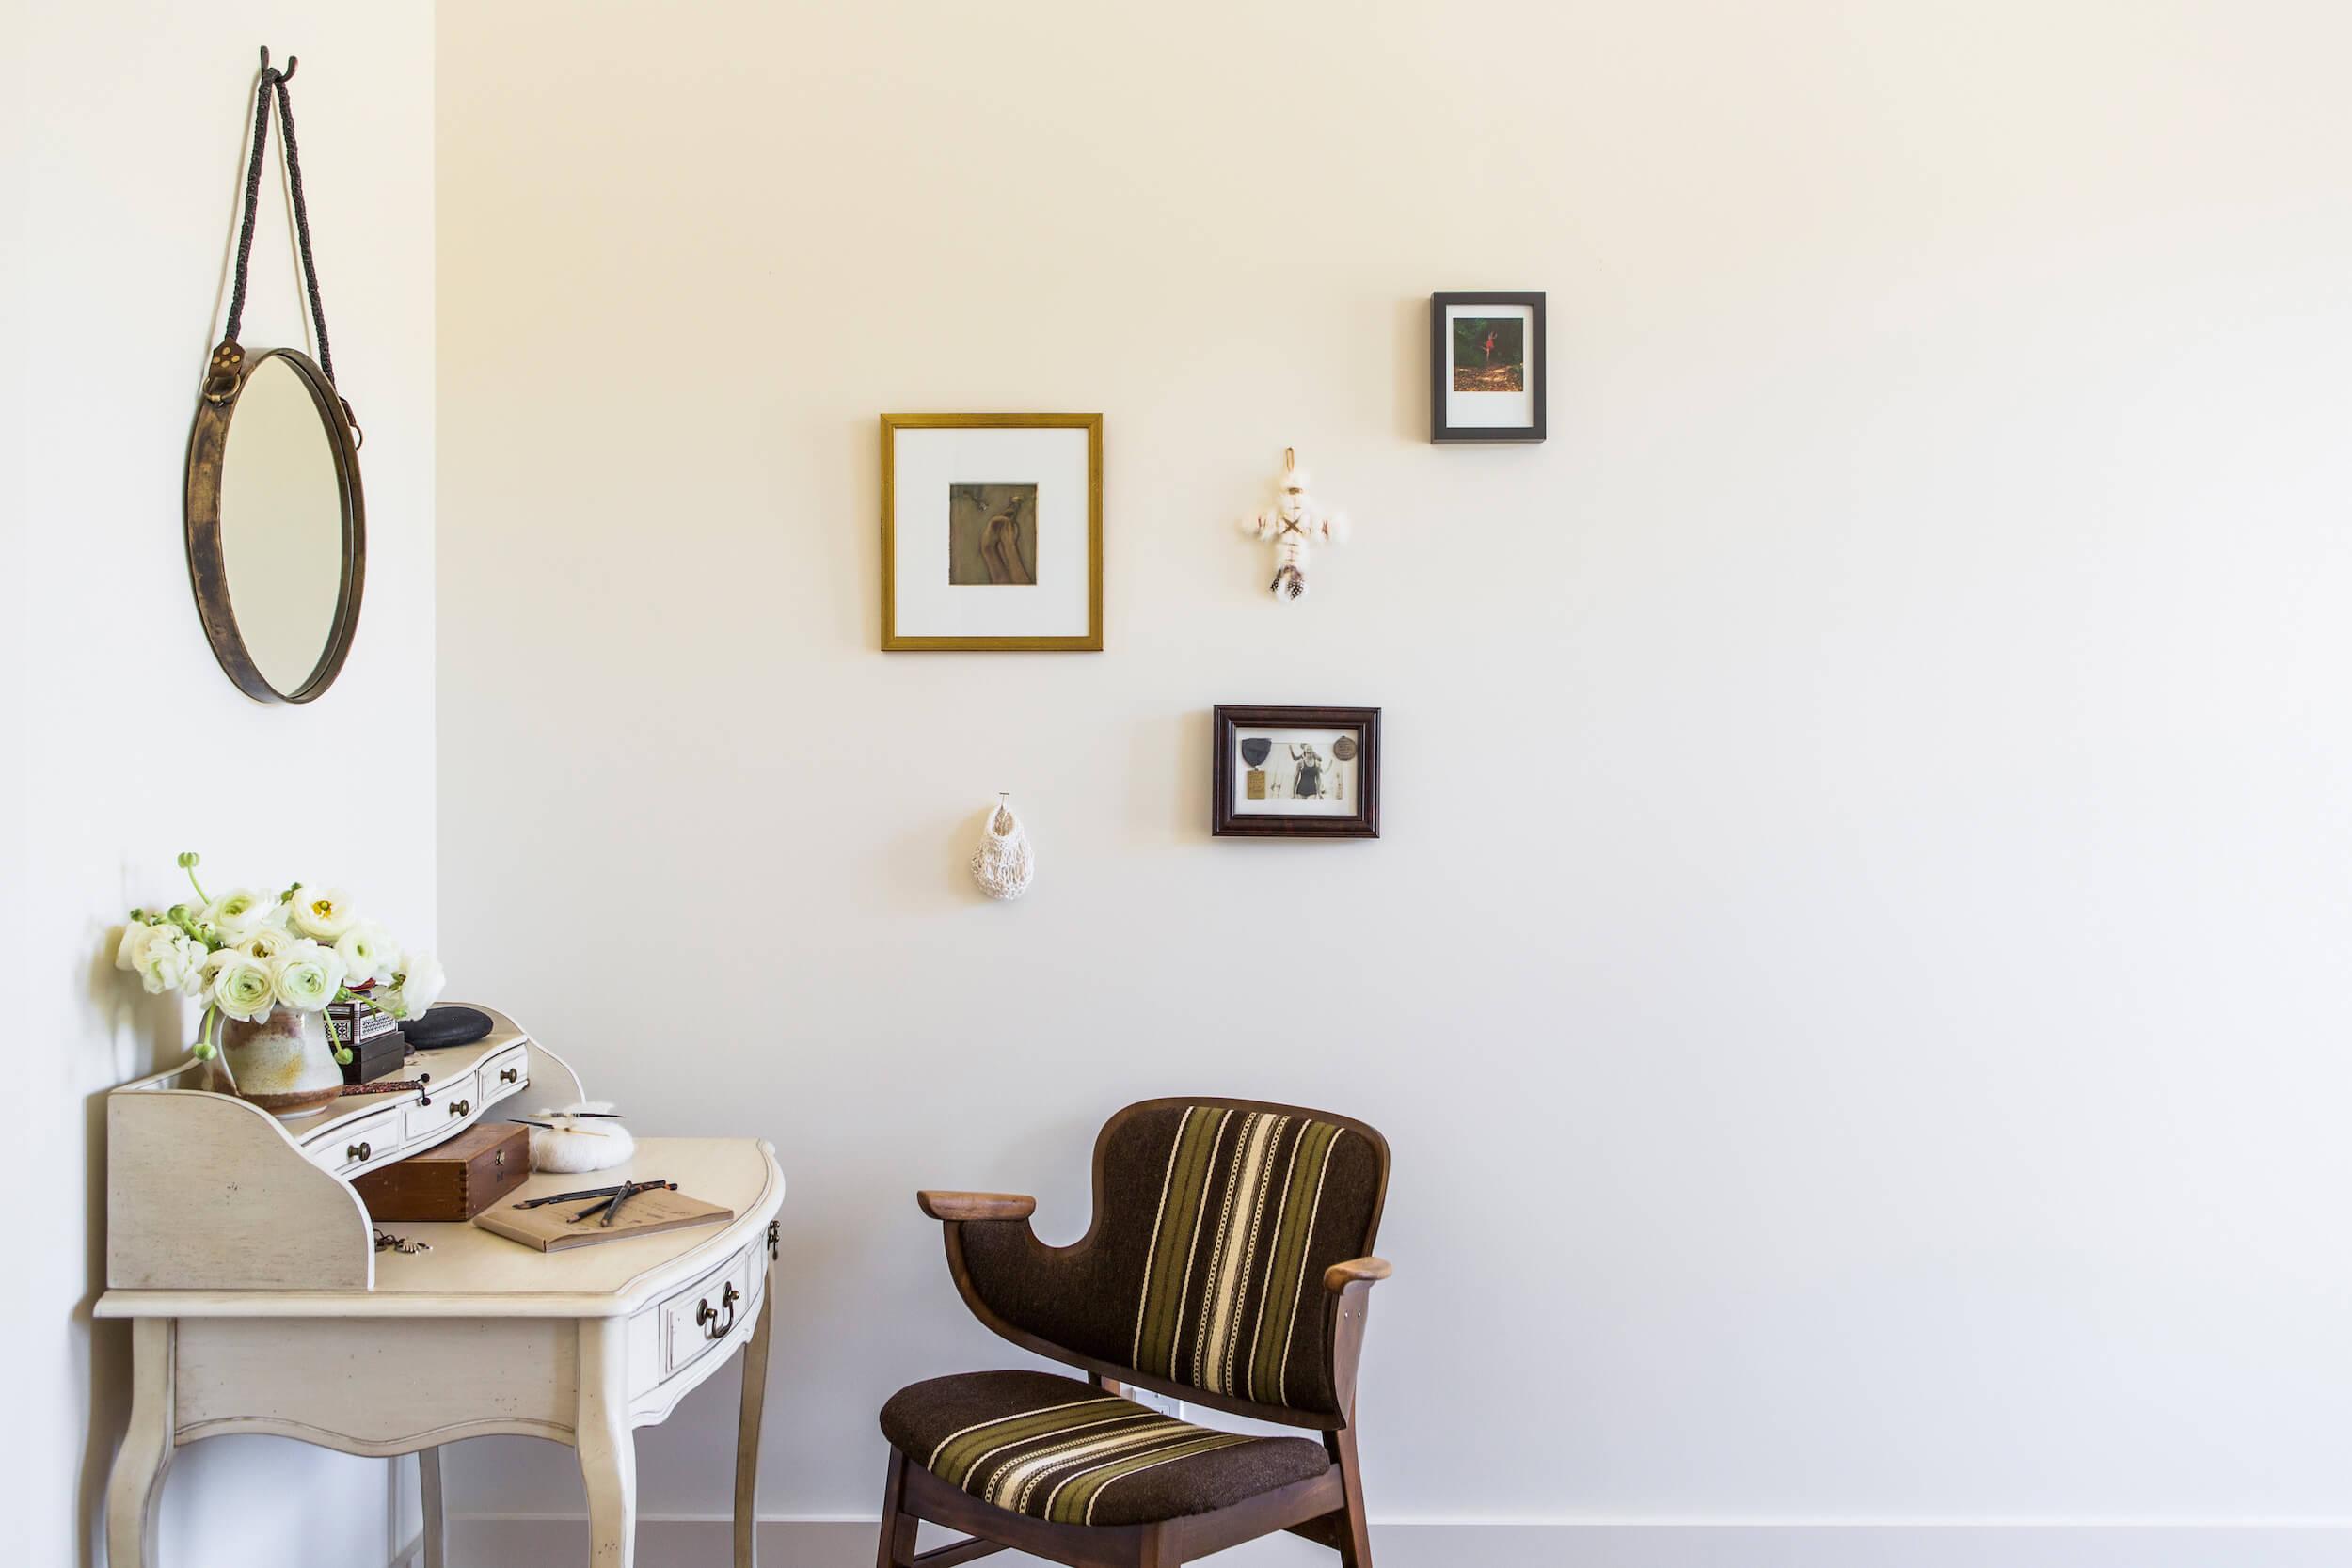 Designer: Gustave Carlson, Photo: Laure Joliet, Stylist: Yedda Morrison